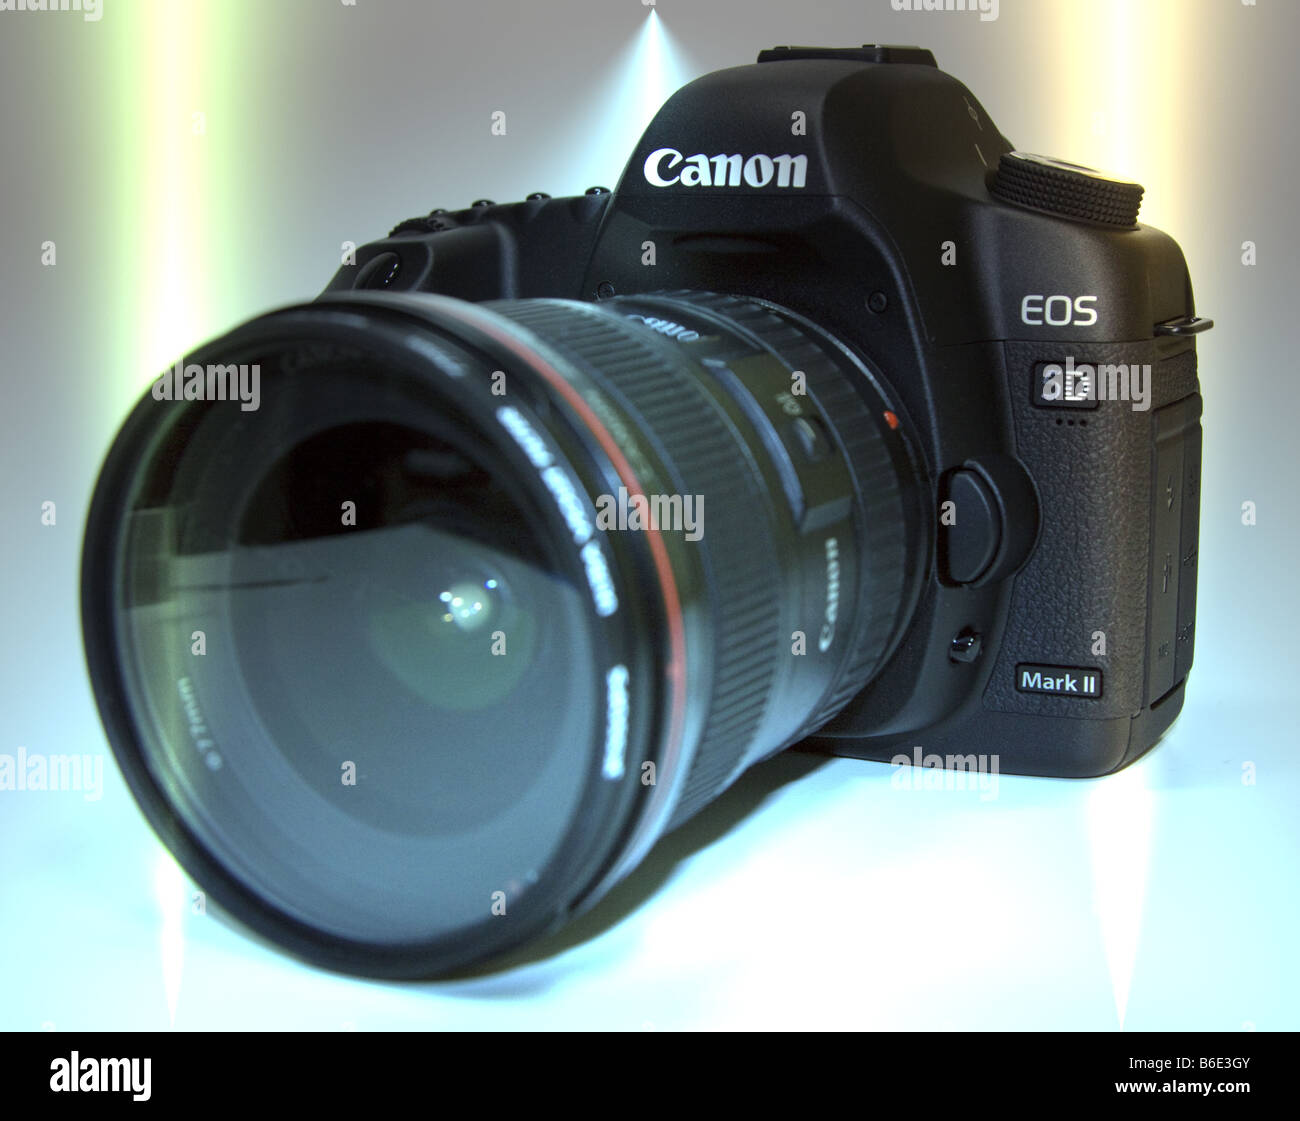 Canon EOS 5D Mk II DSLR 21 Megapixal Camera - Stock Image